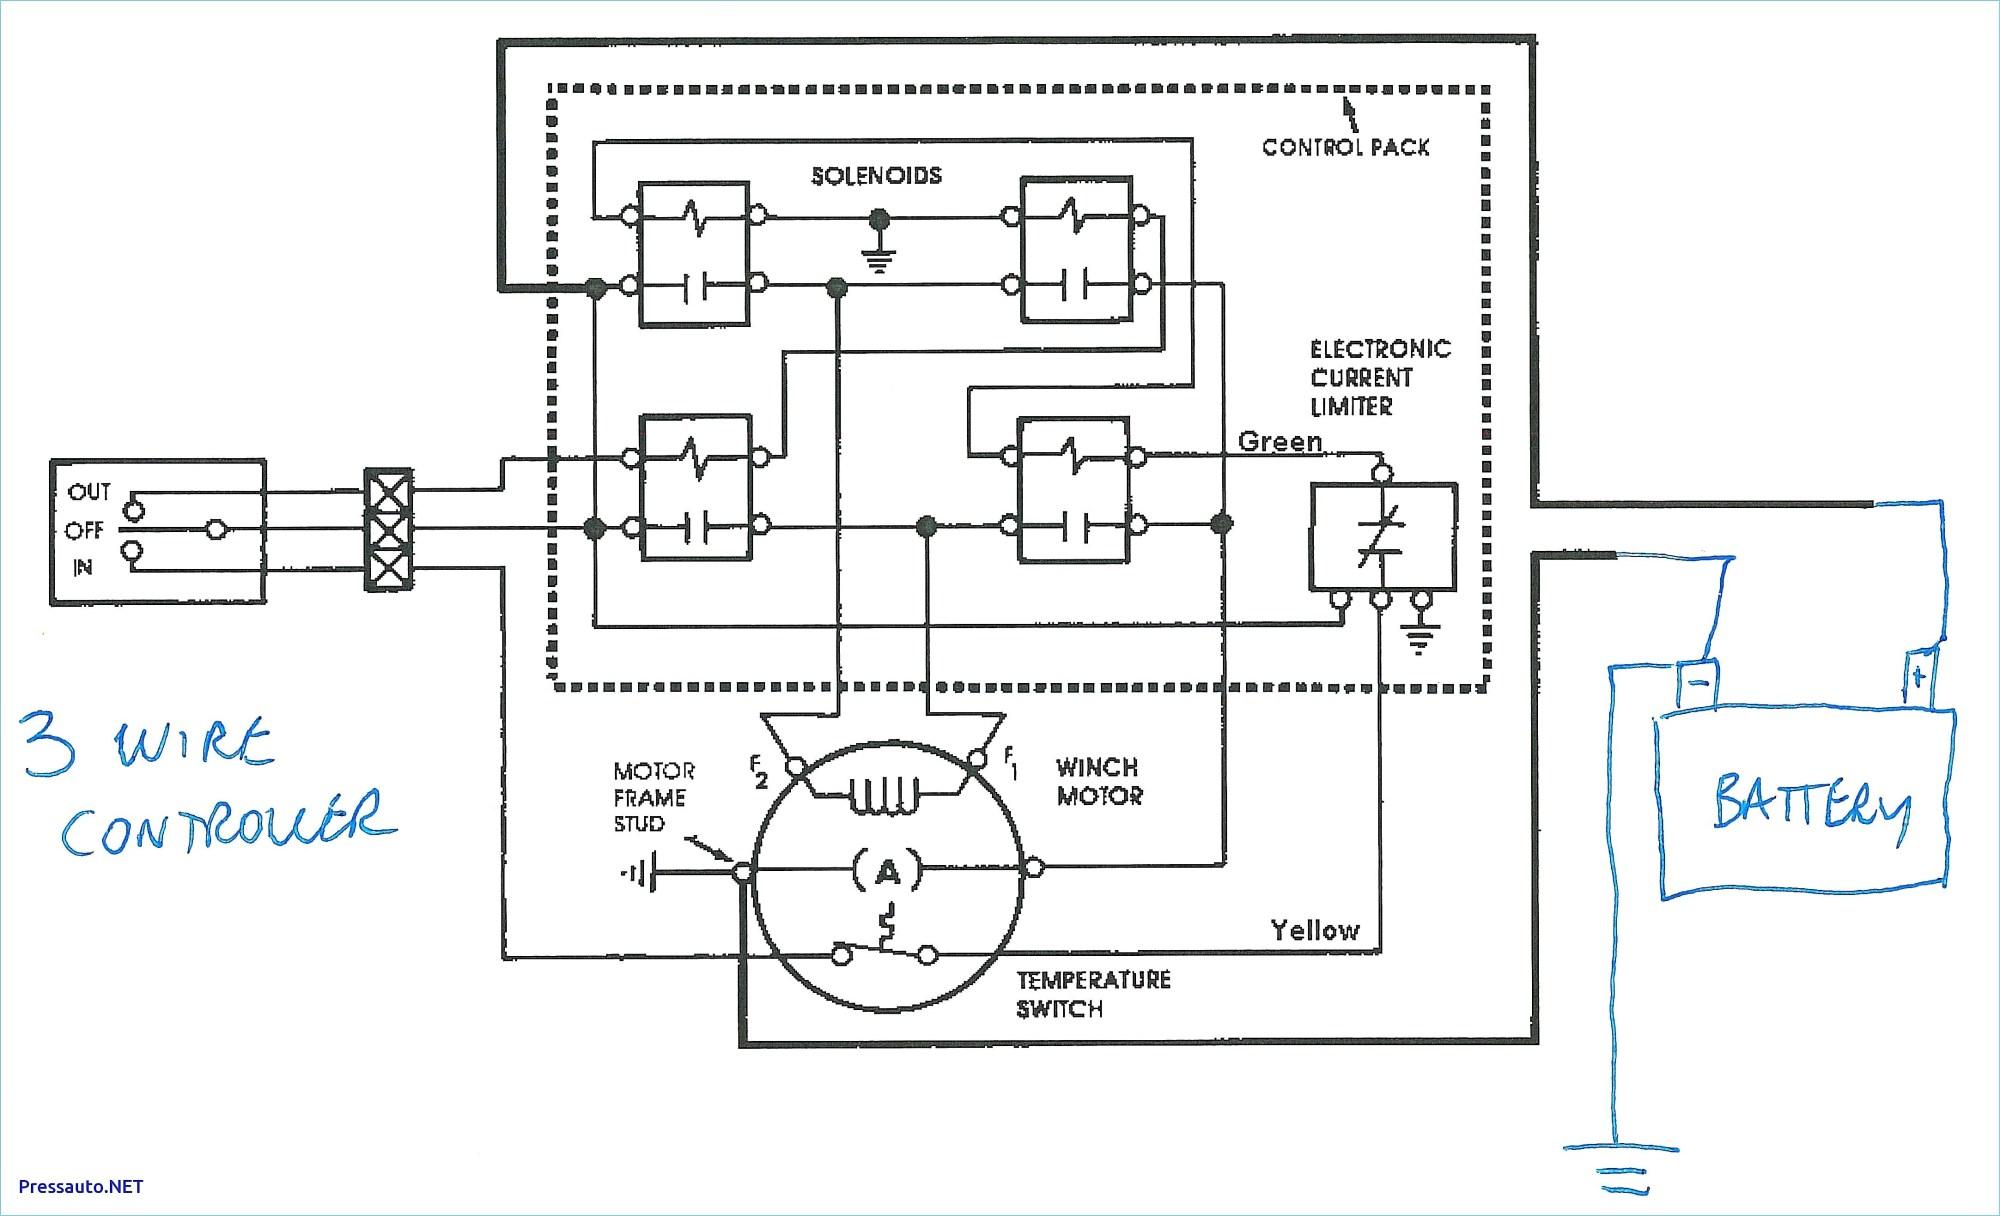 hight resolution of warn winch wiring diagram 4 solenoid badland winch wiring diagram unique warn 12k winch wiring